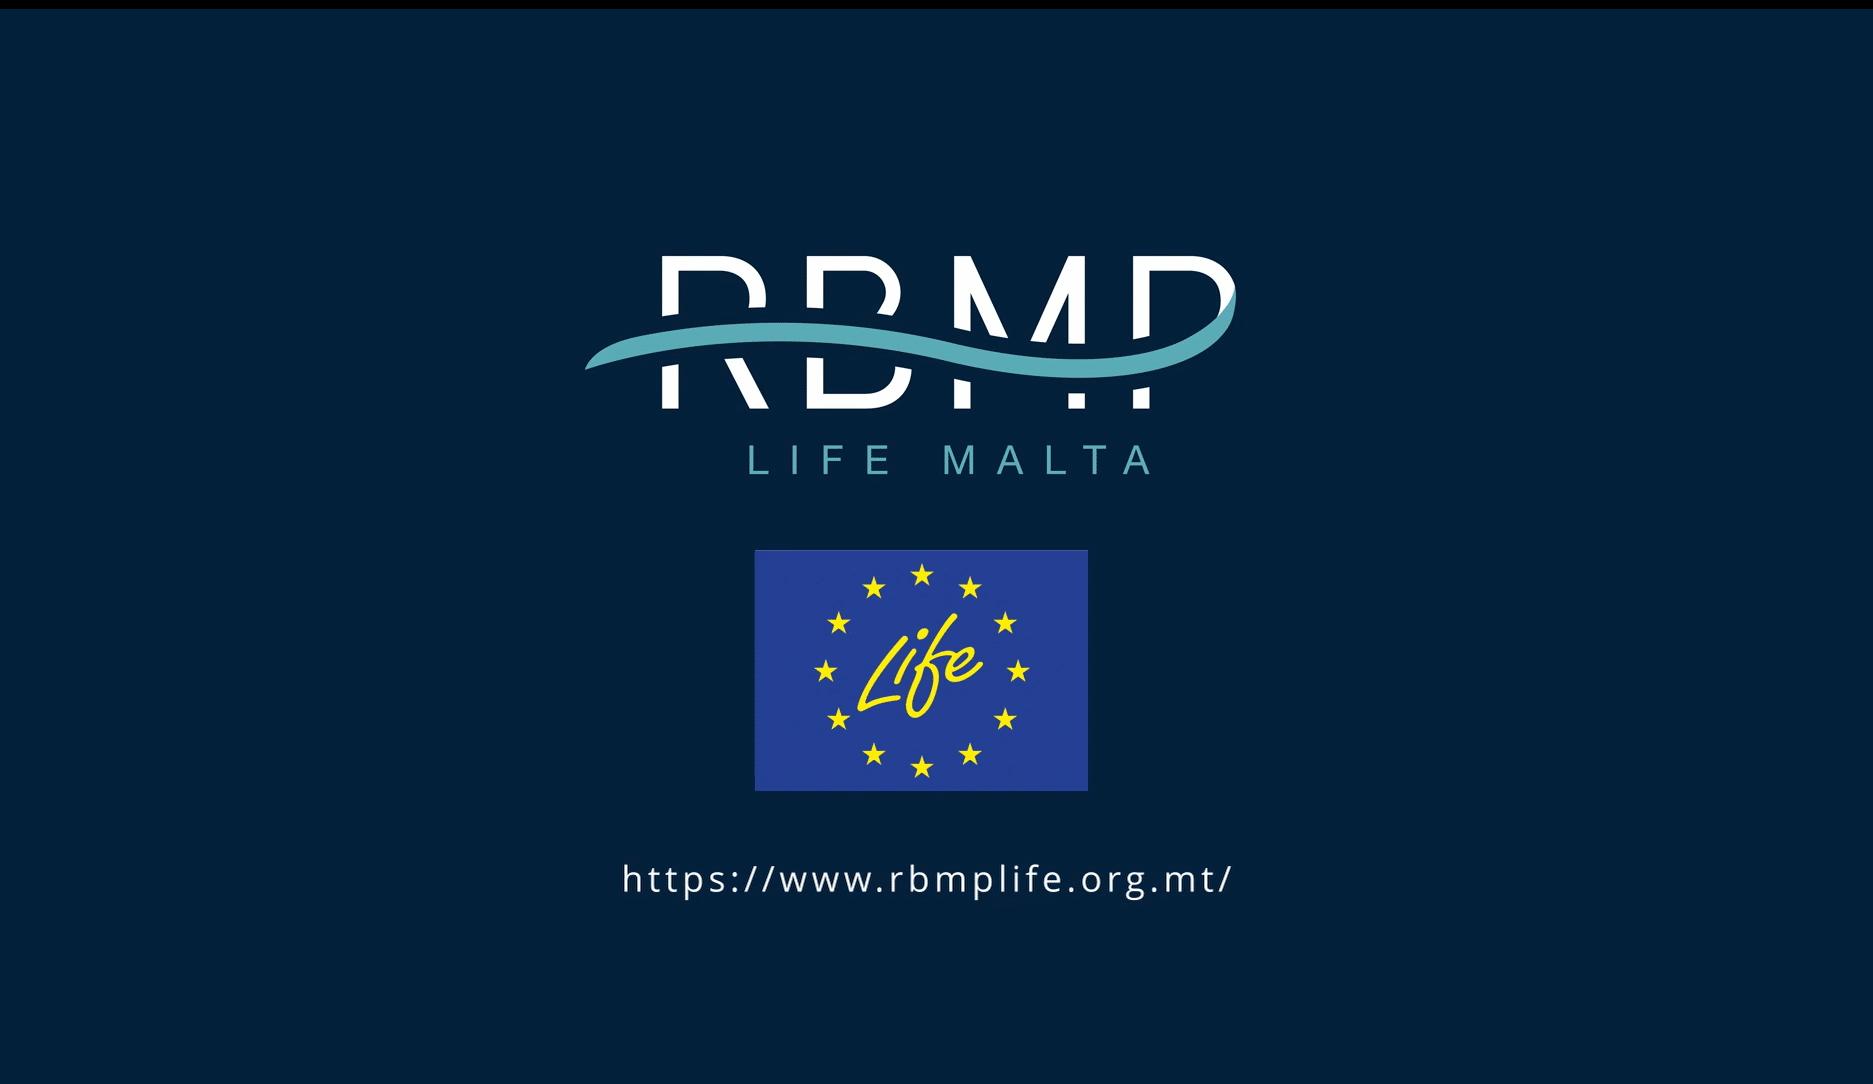 RBMP Life